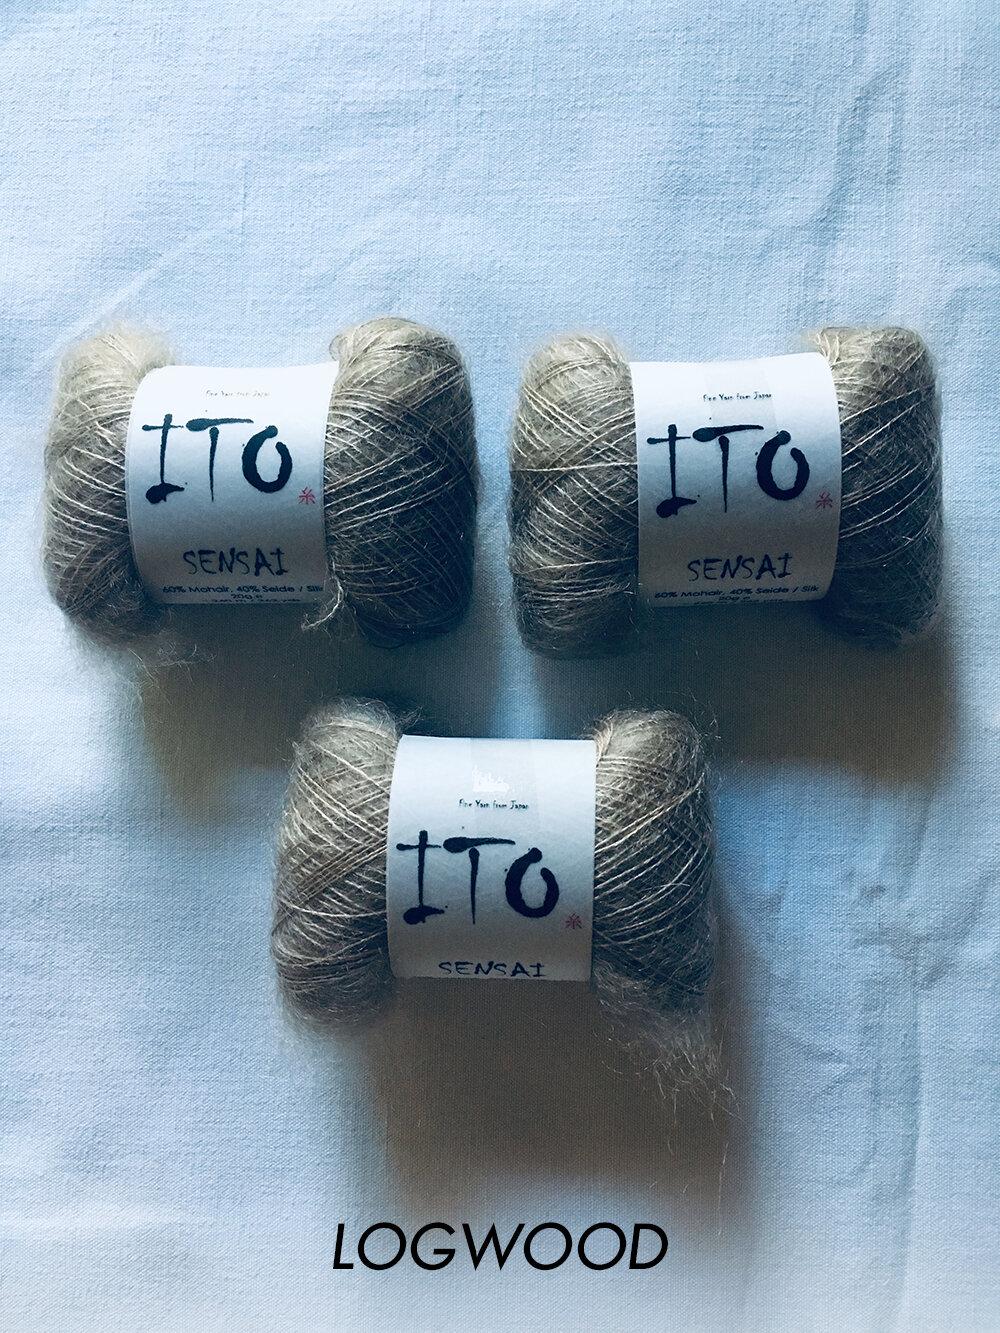 ito_sensai_logwood_331_wool_done_knitting.jpg